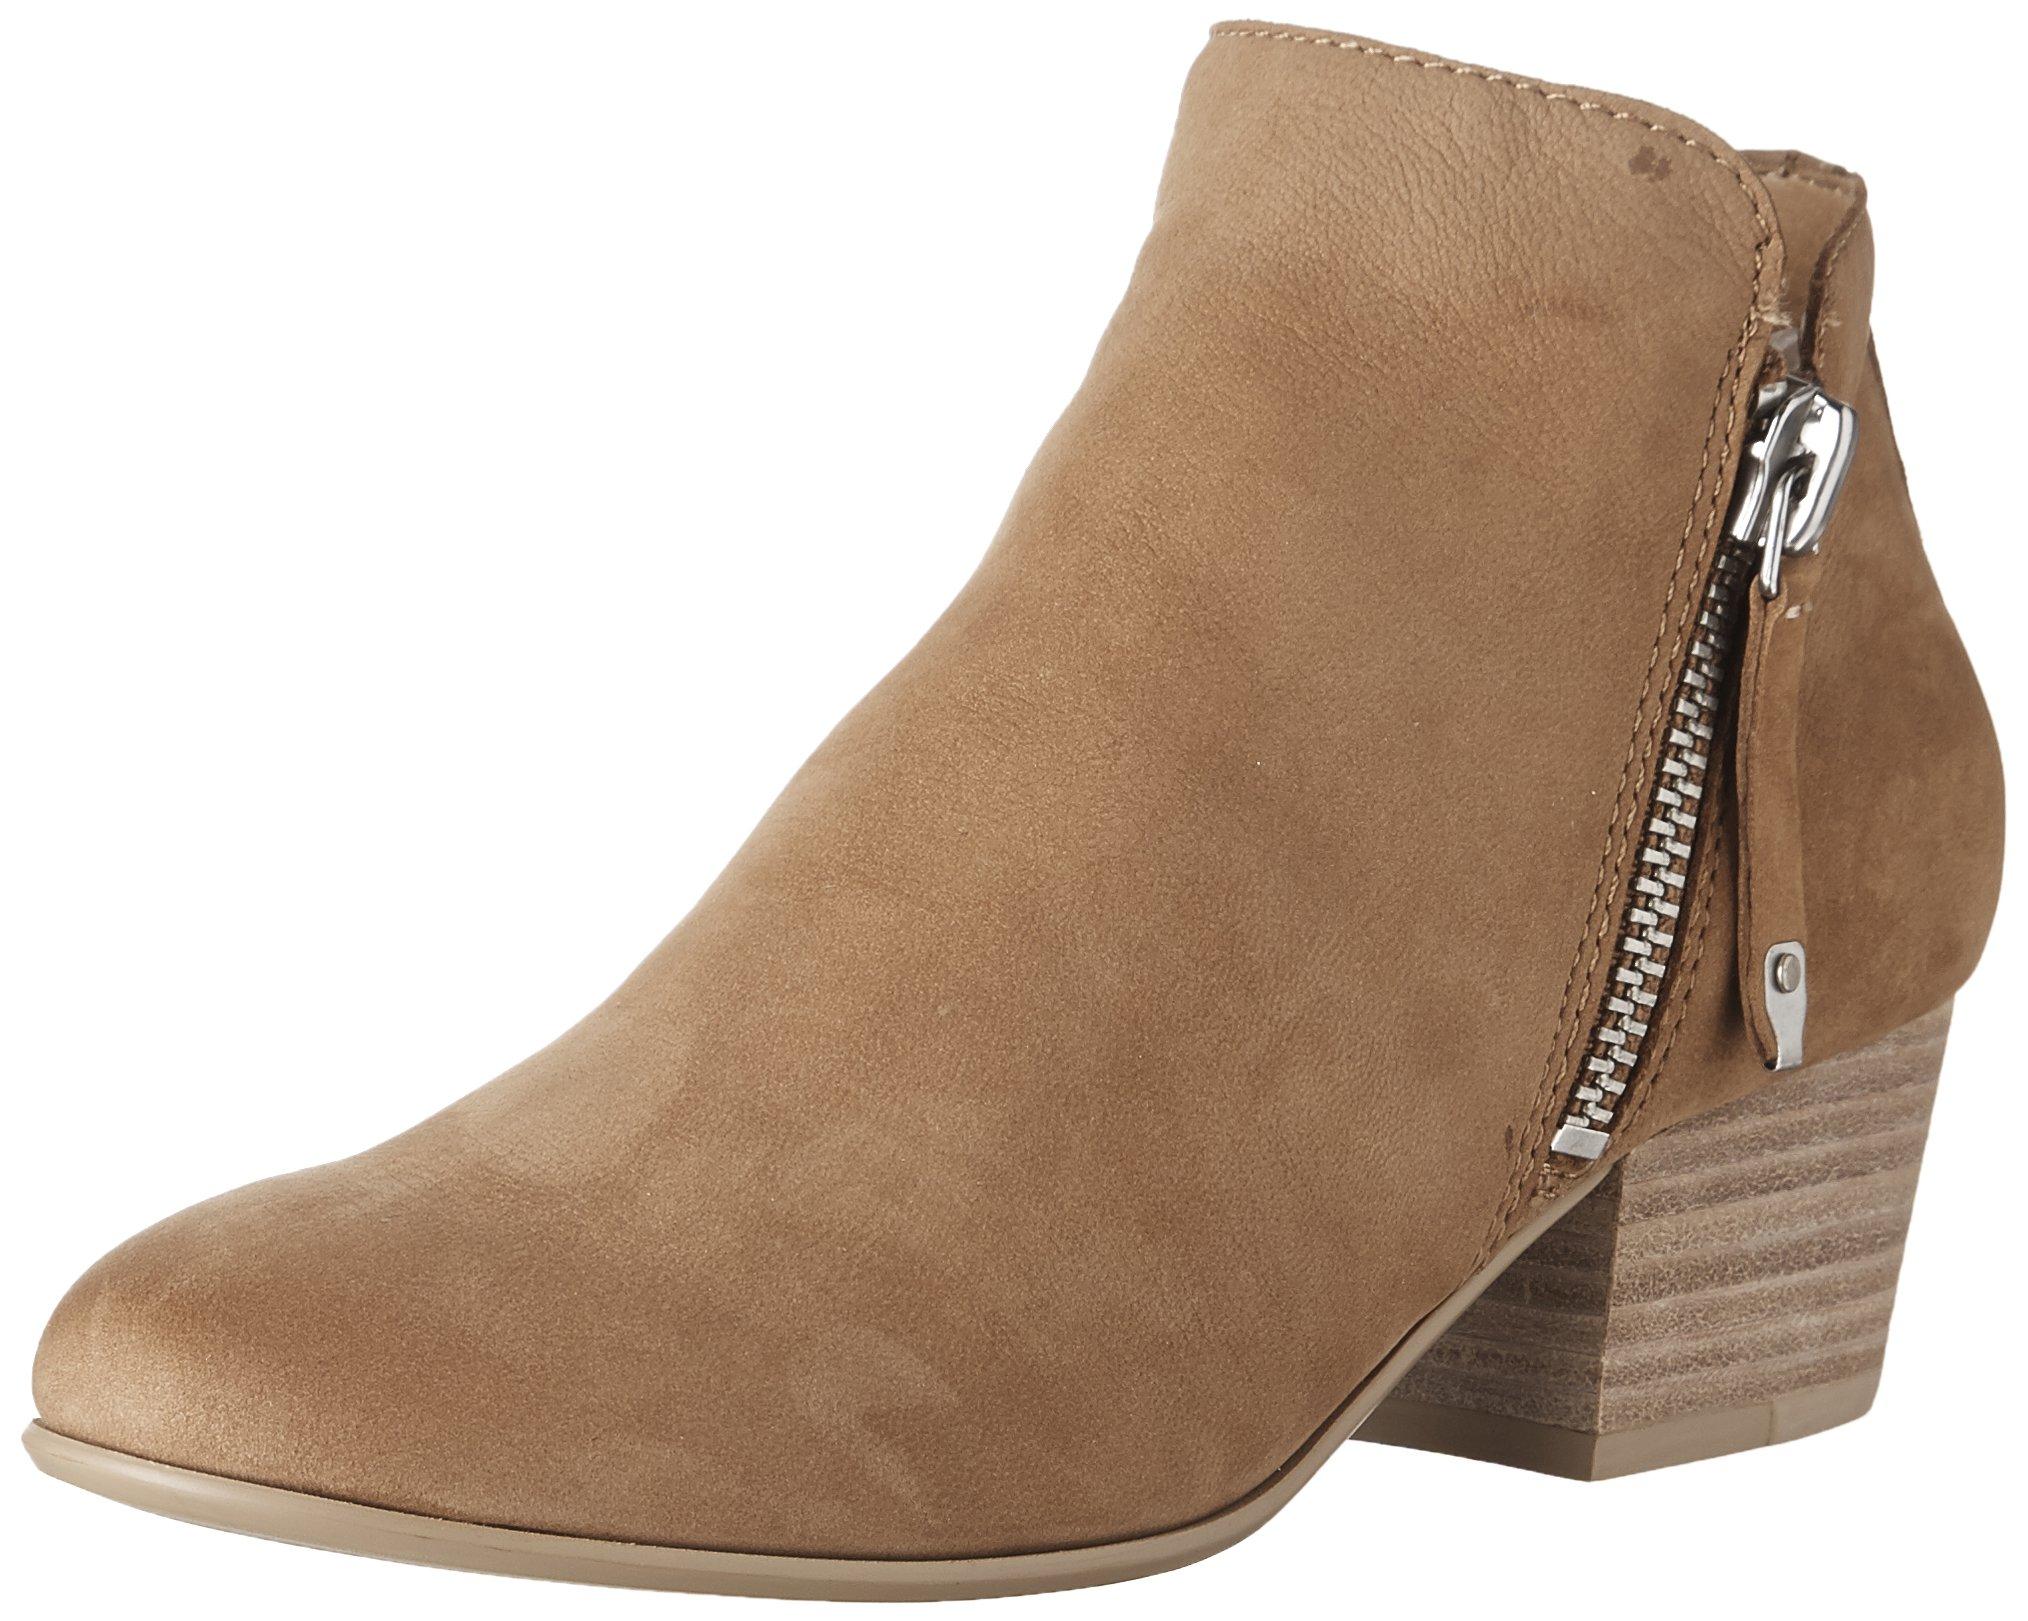 Dolce Vita Women's Gertie Ankle Boot, Saddle Nubuck, 6.5 Medium US